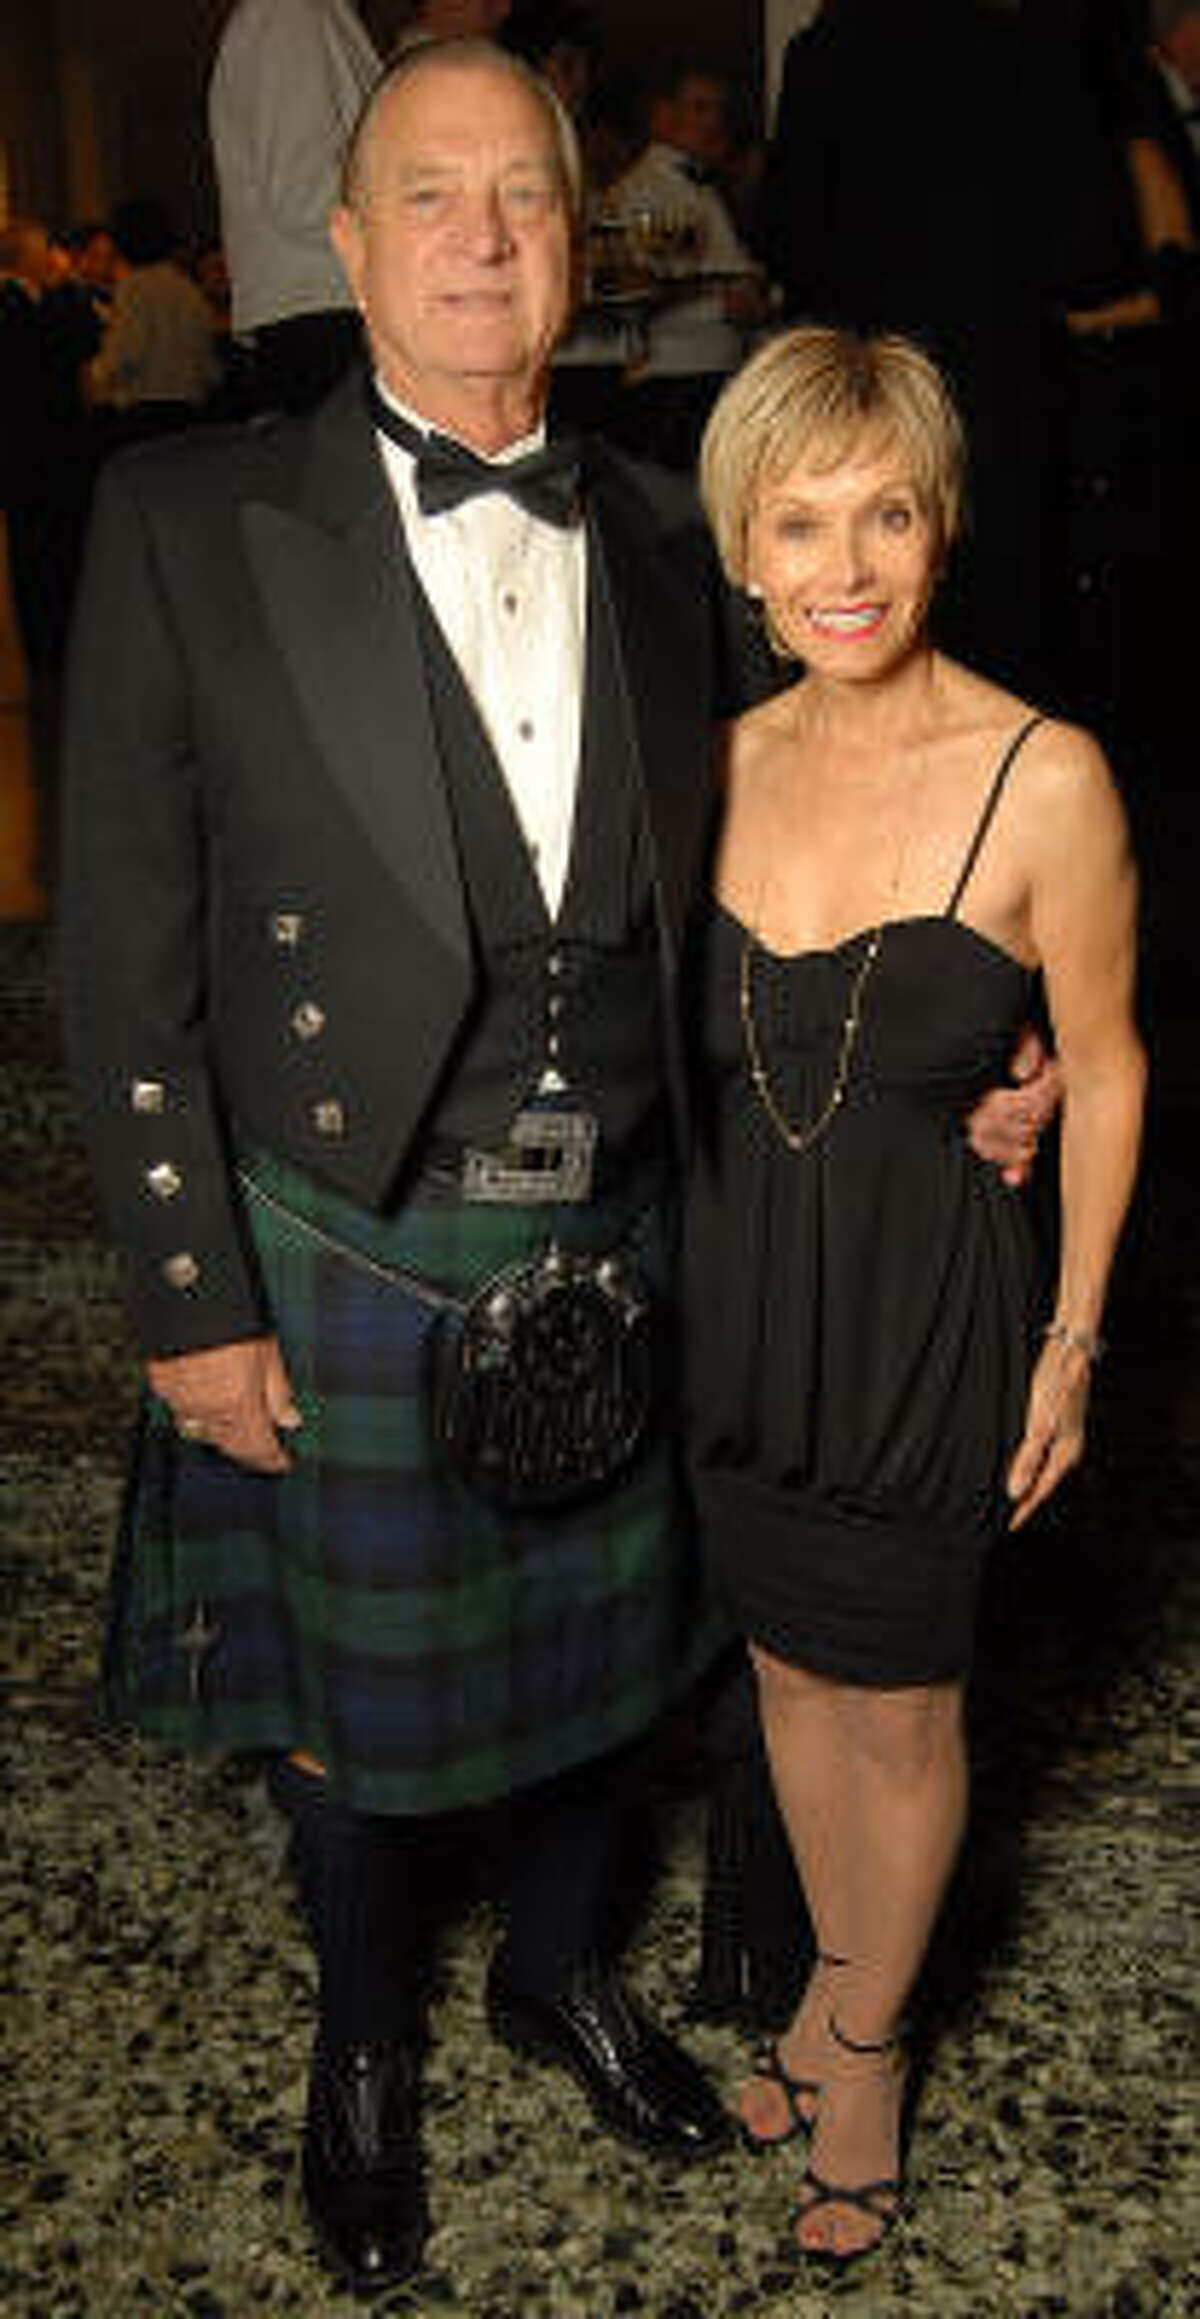 John Ebeling and Daryle Lynne Ebeling